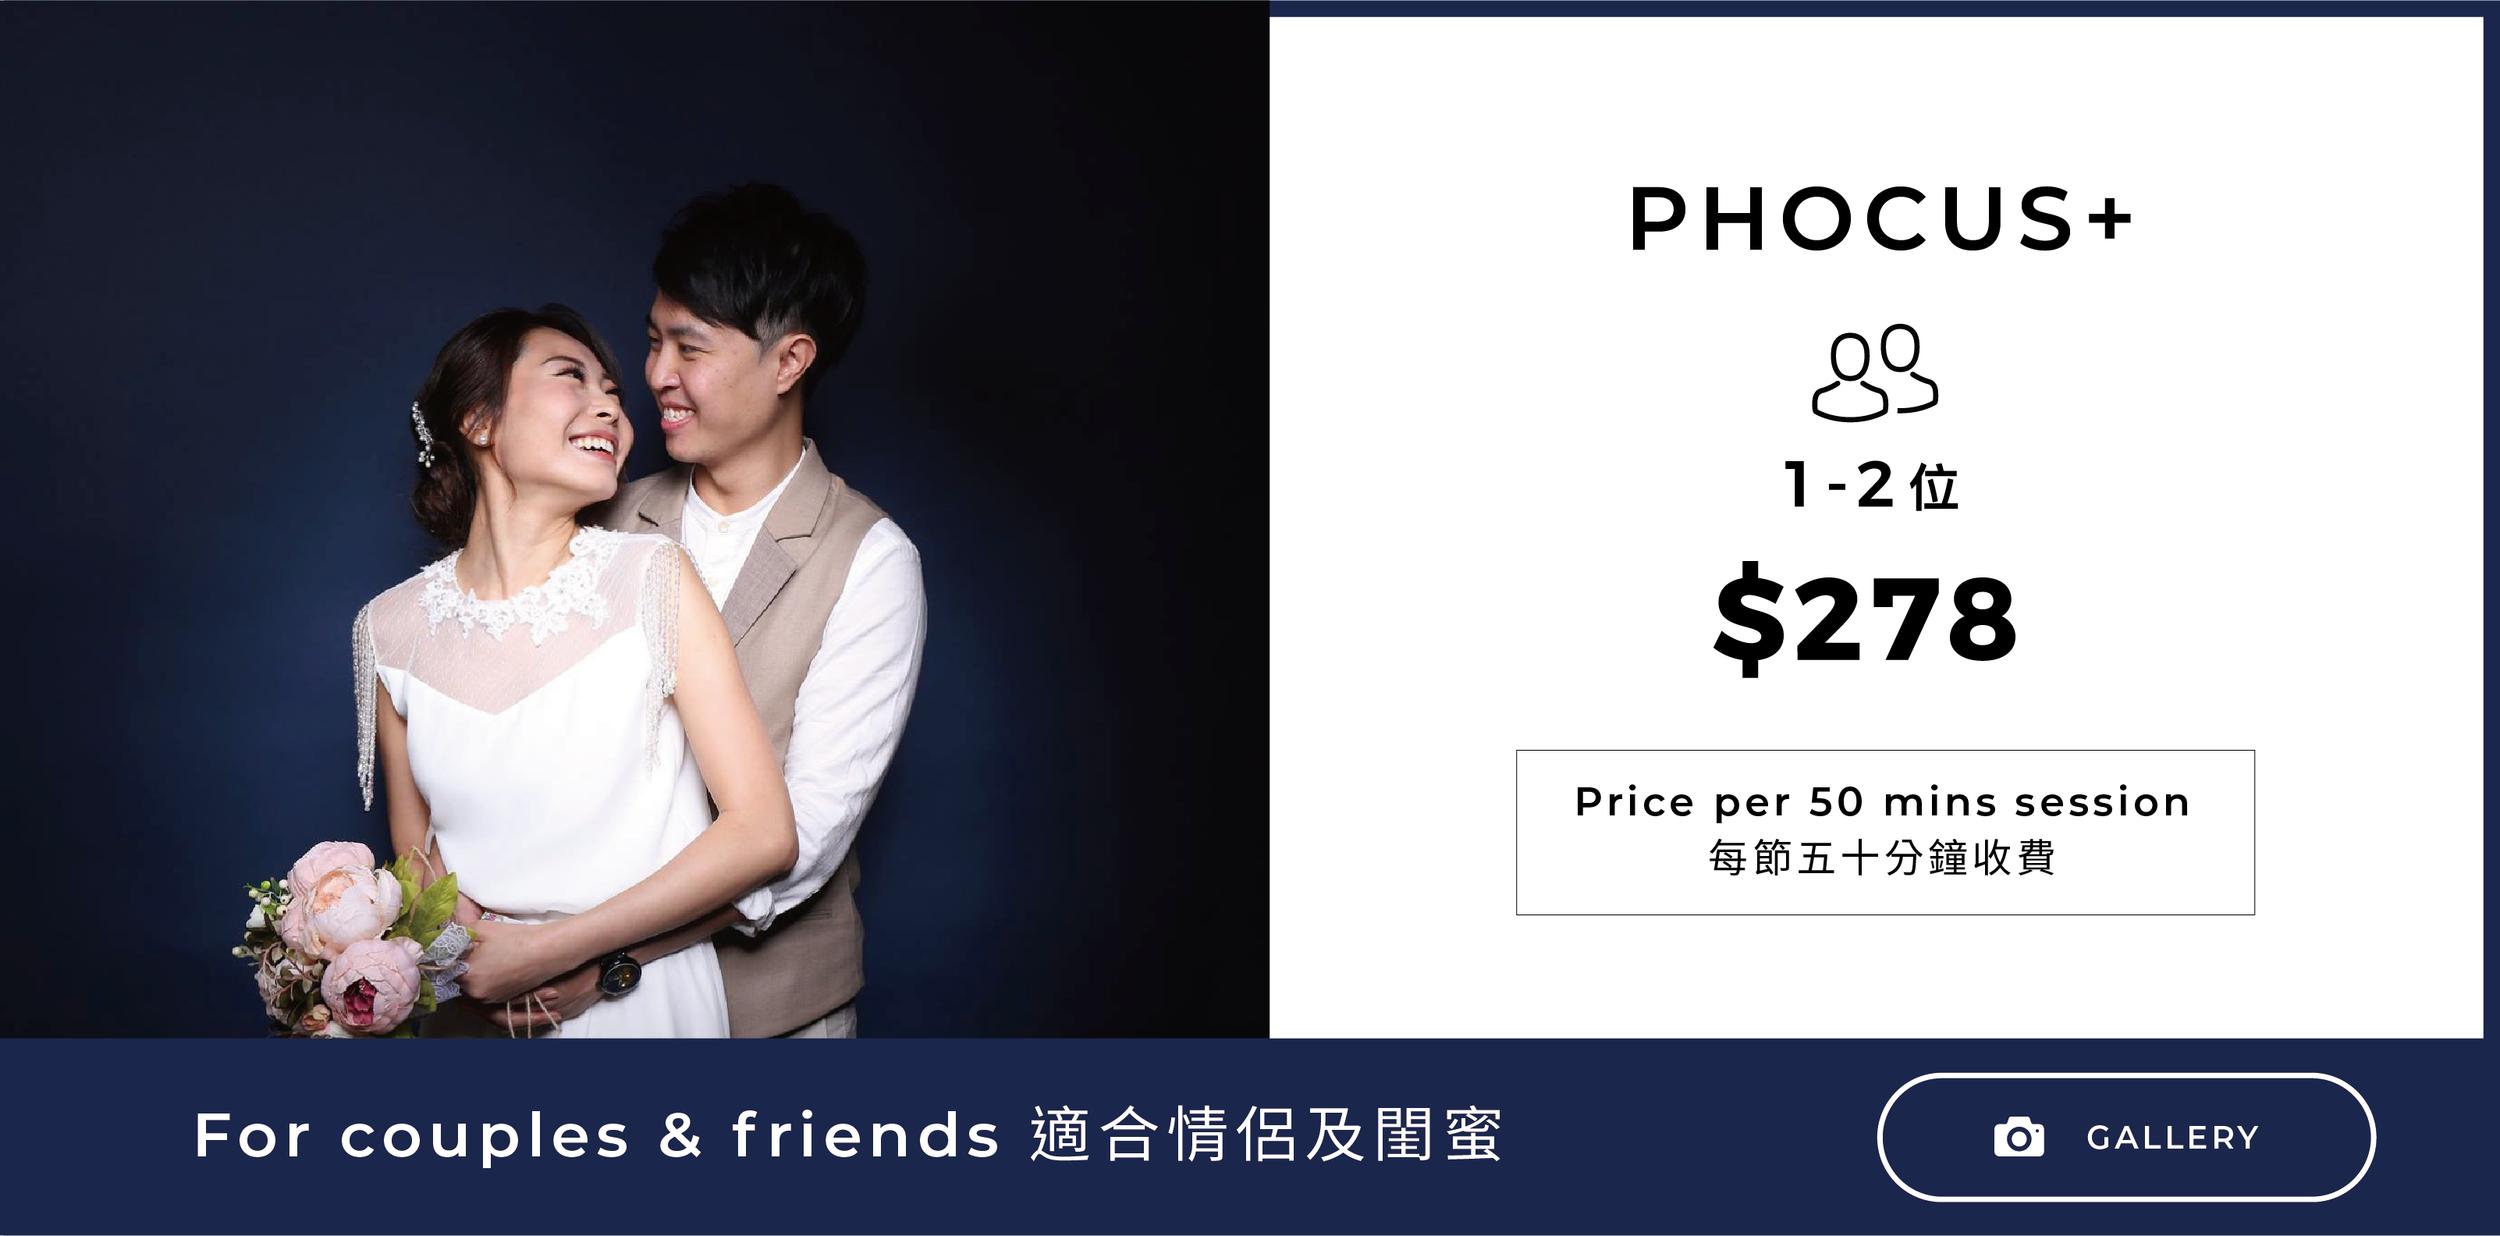 Price list for web_工作區域 1 複本 4.png